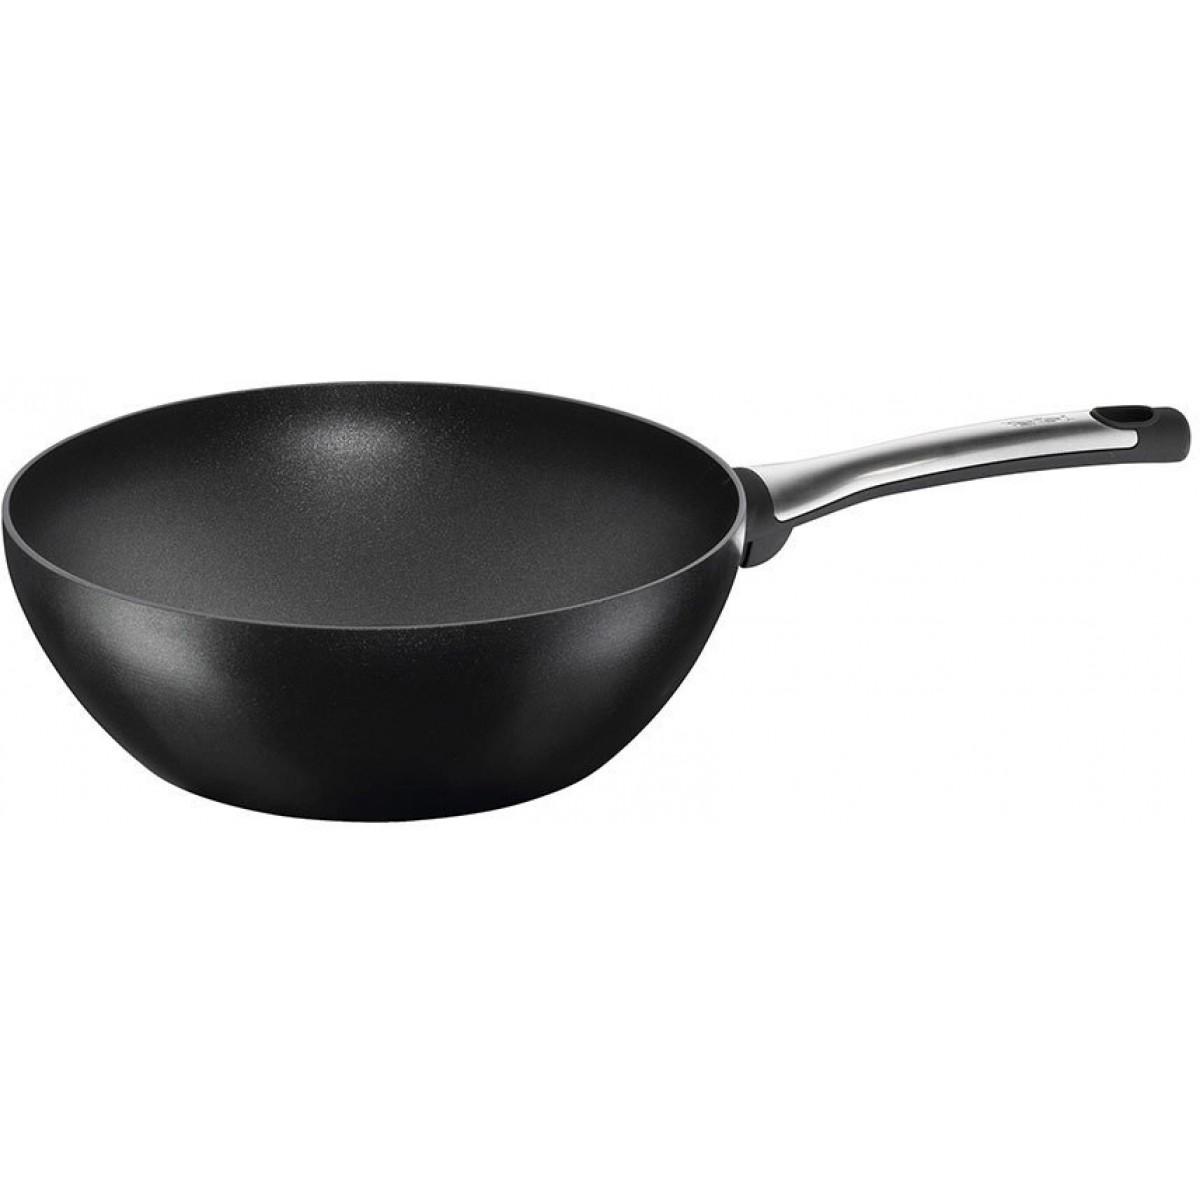 TEFAL Talent Pro wokpande 28 cm.